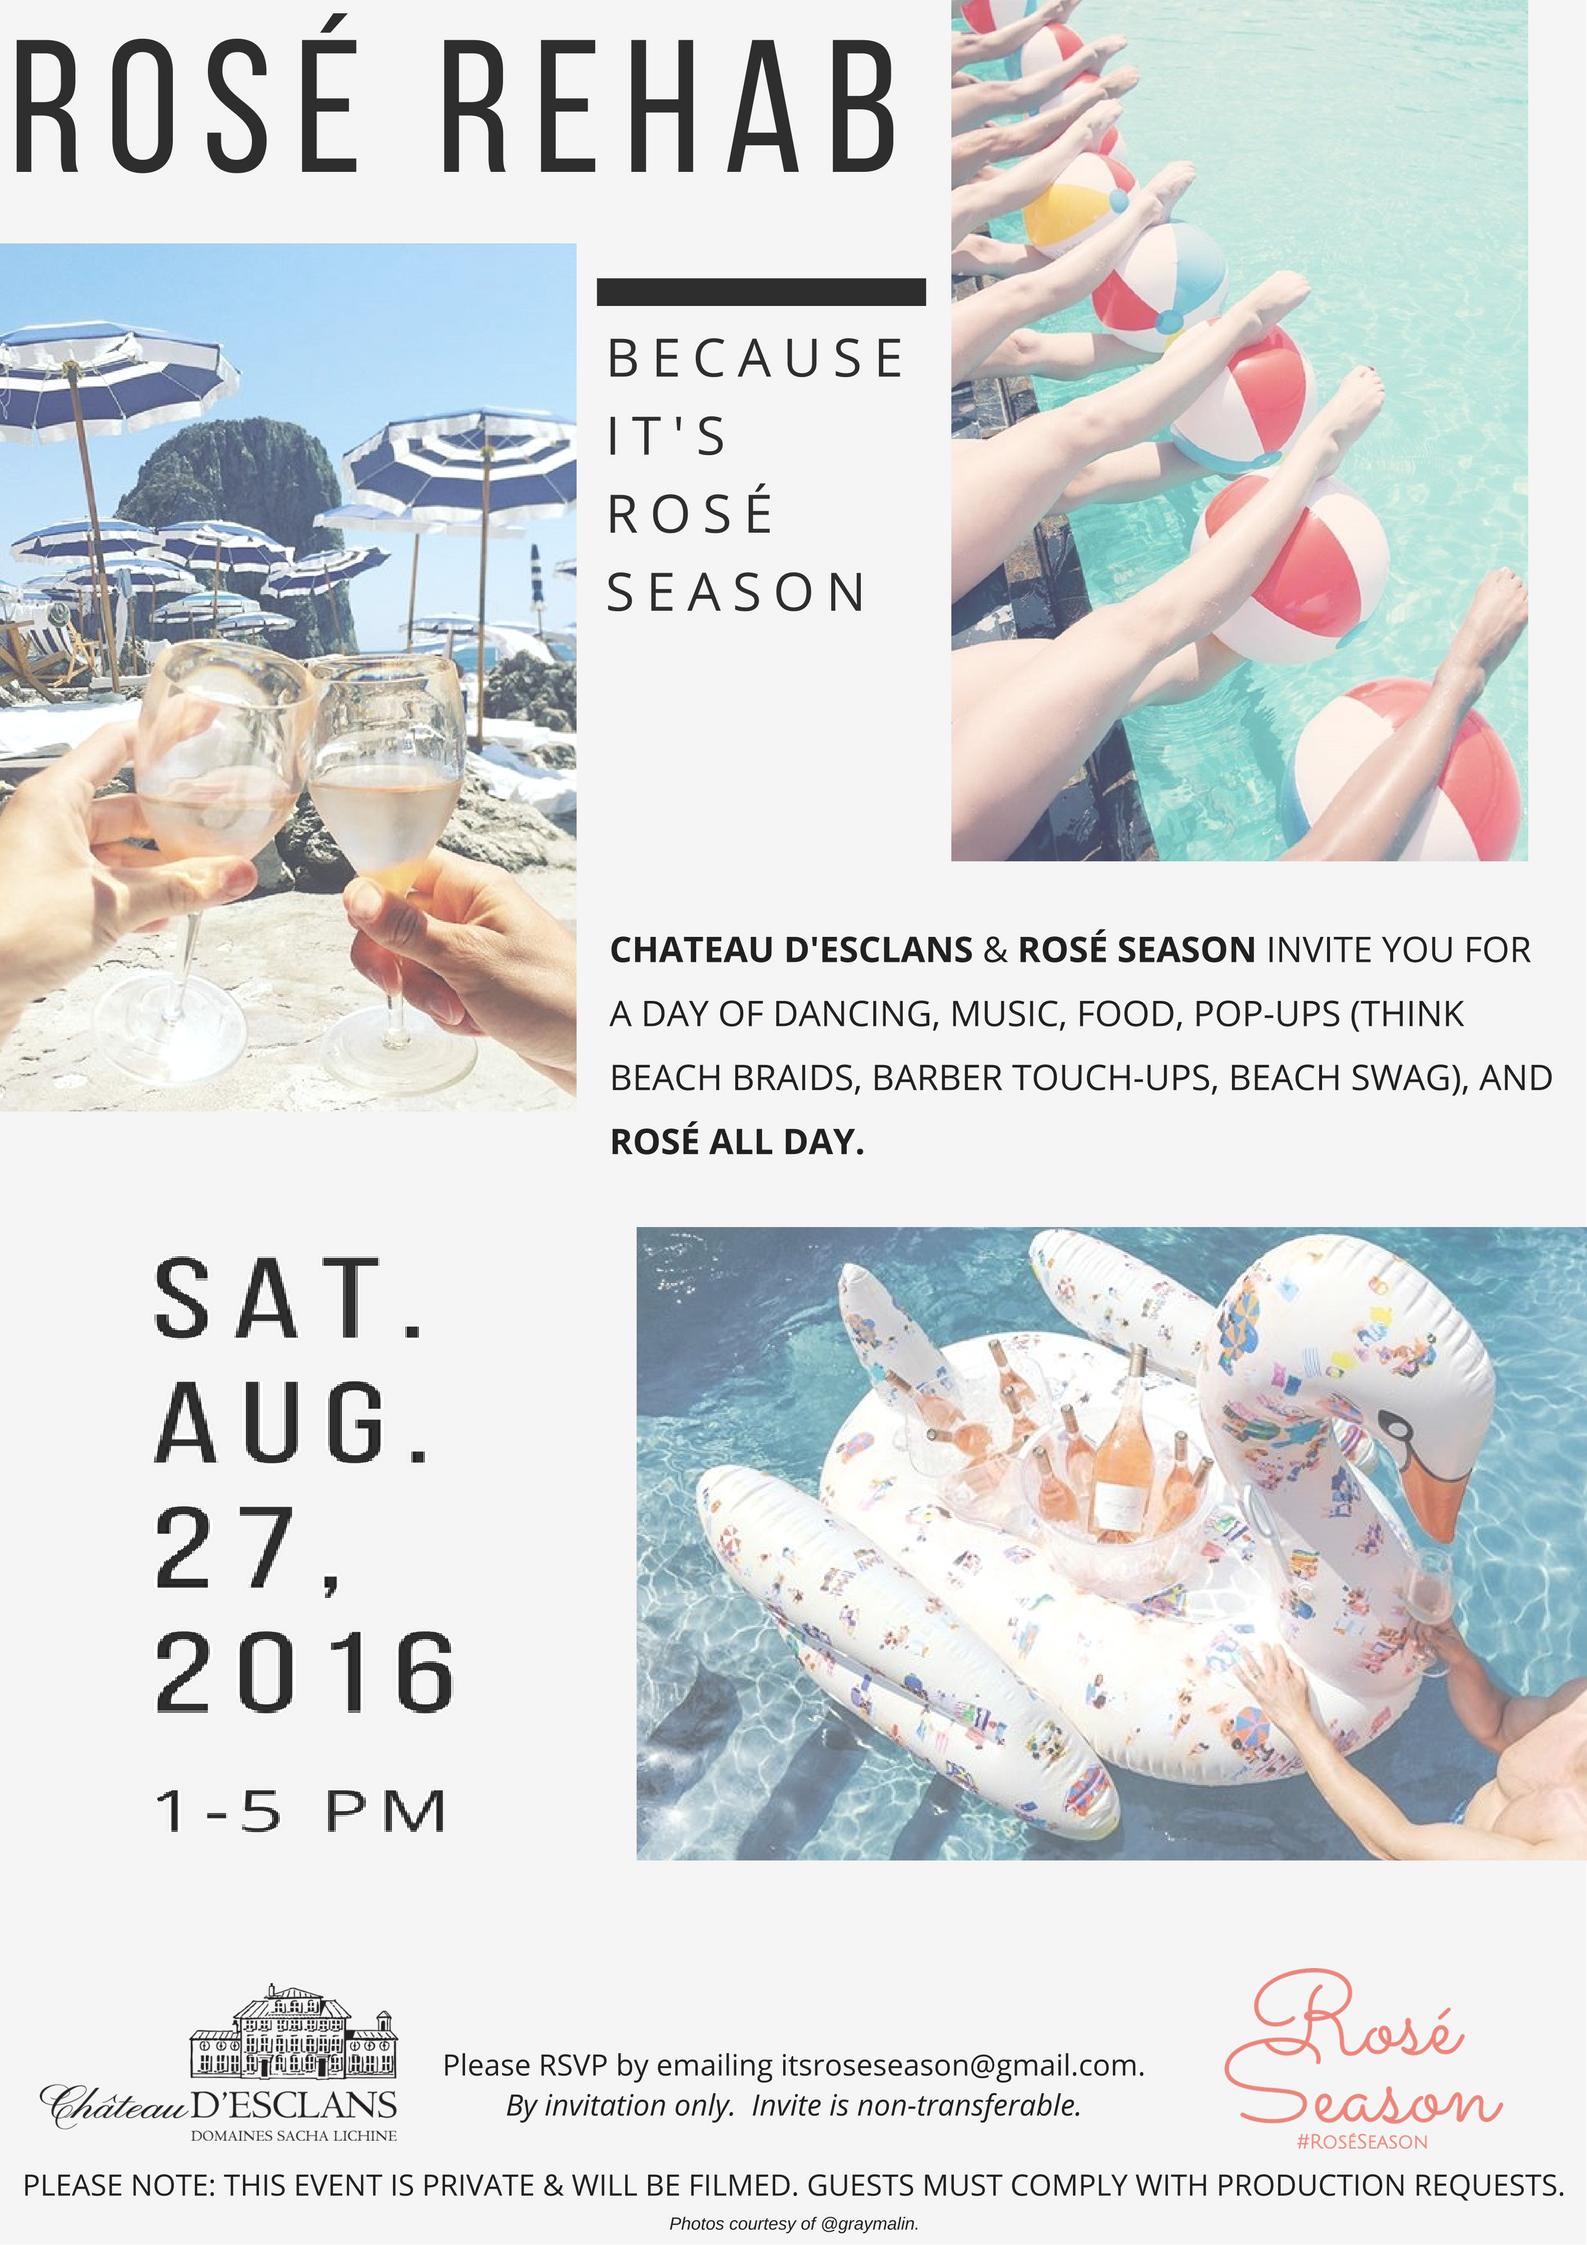 Rosé Rehab General Invitation - Aug 27, 2016.png